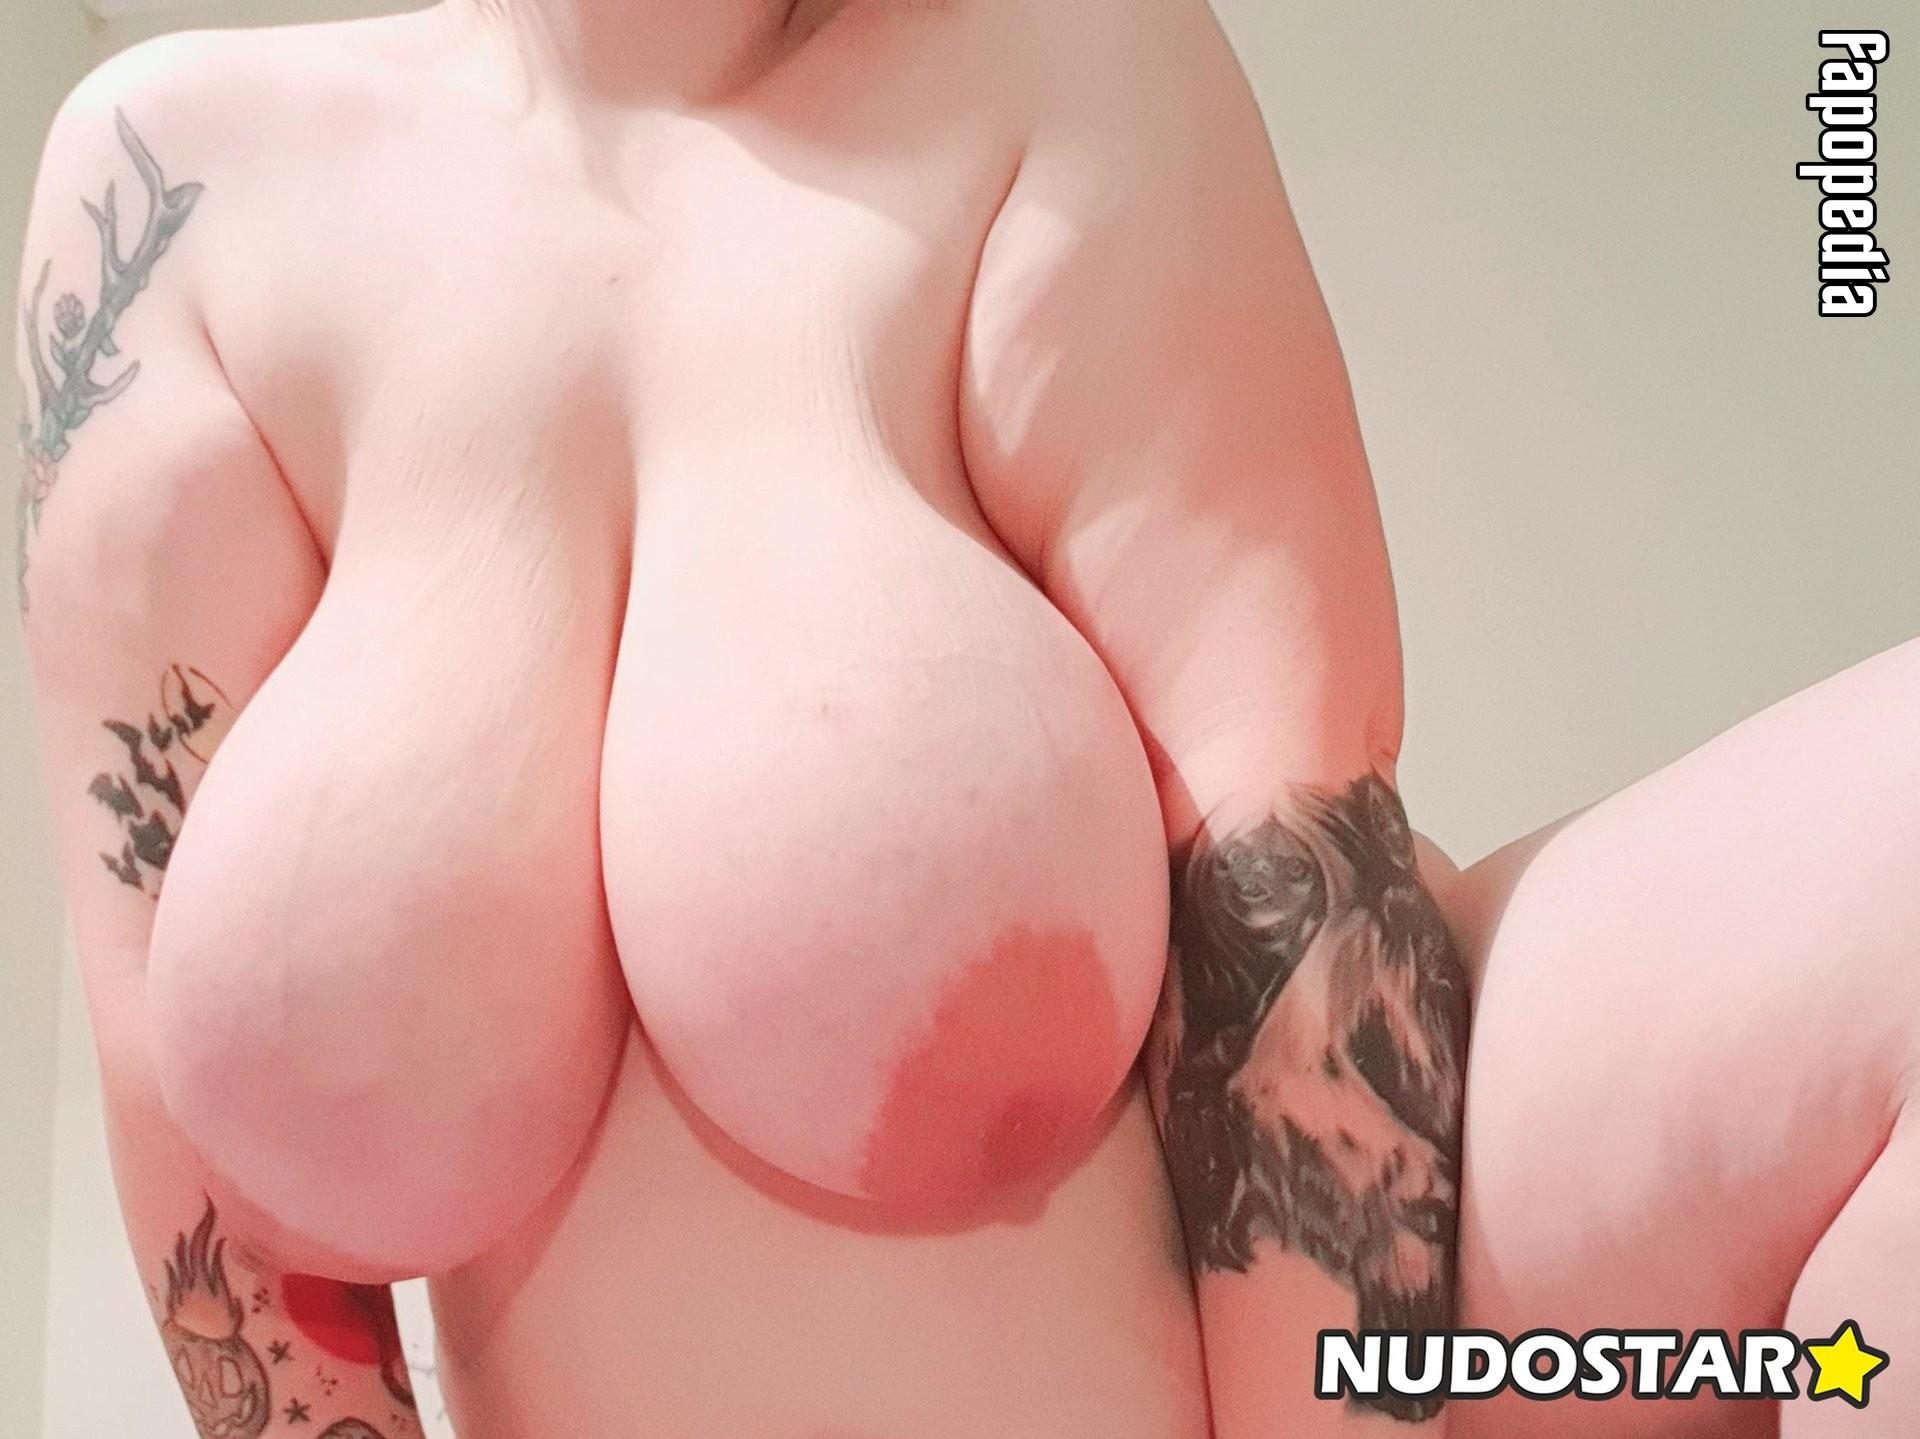 Gigiouija Nude OnlyFans Leaks